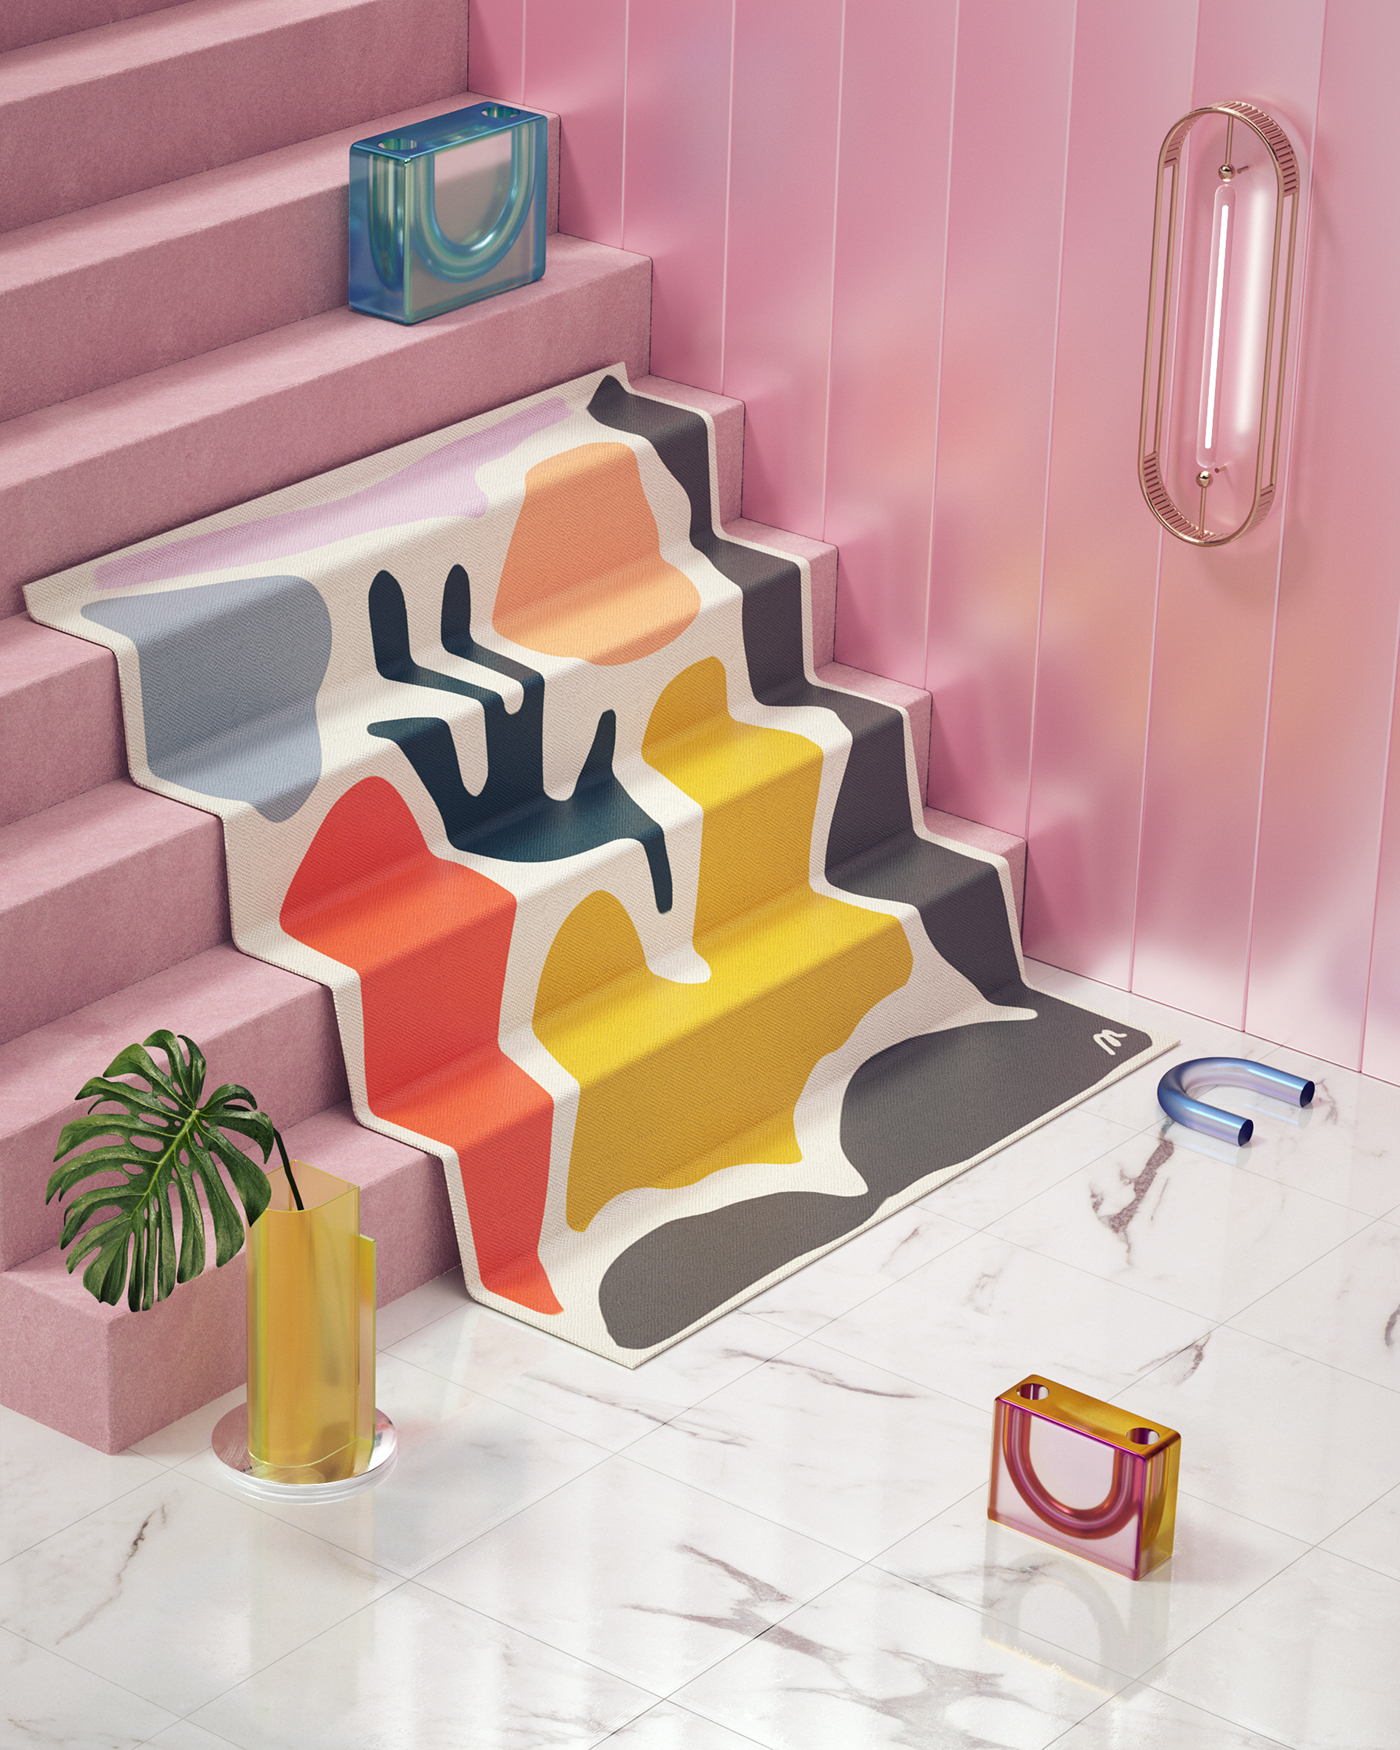 3D fabric c4d octane Marble workspace design textile Rug CGI